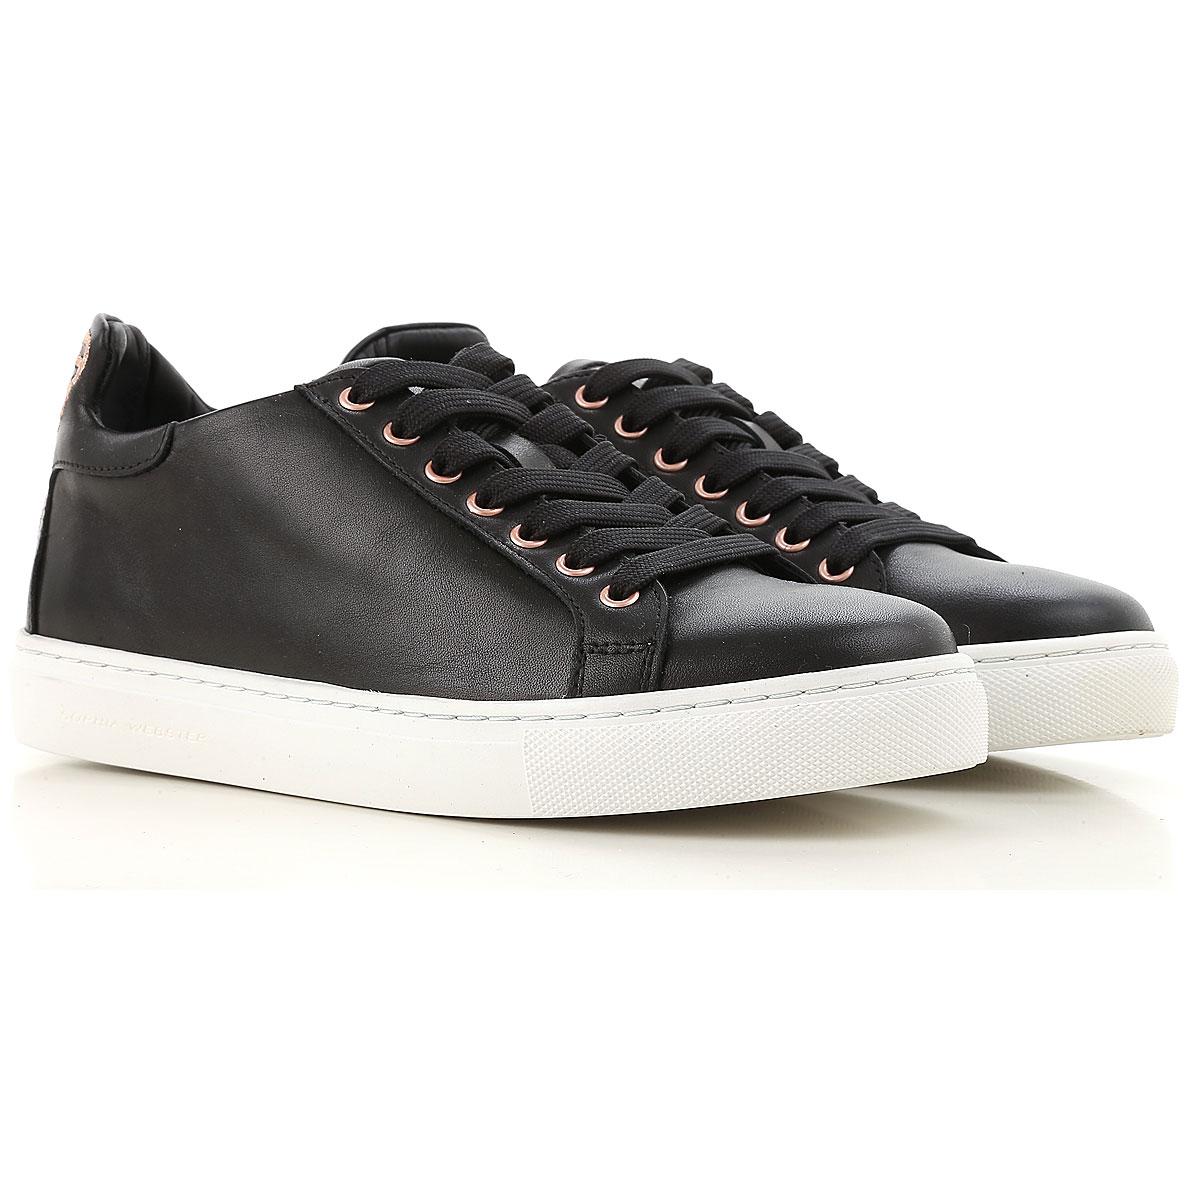 Sophia Webster Sneakers for Women On Sale in Outlet, Black, Leather, 2019, 5 6.5